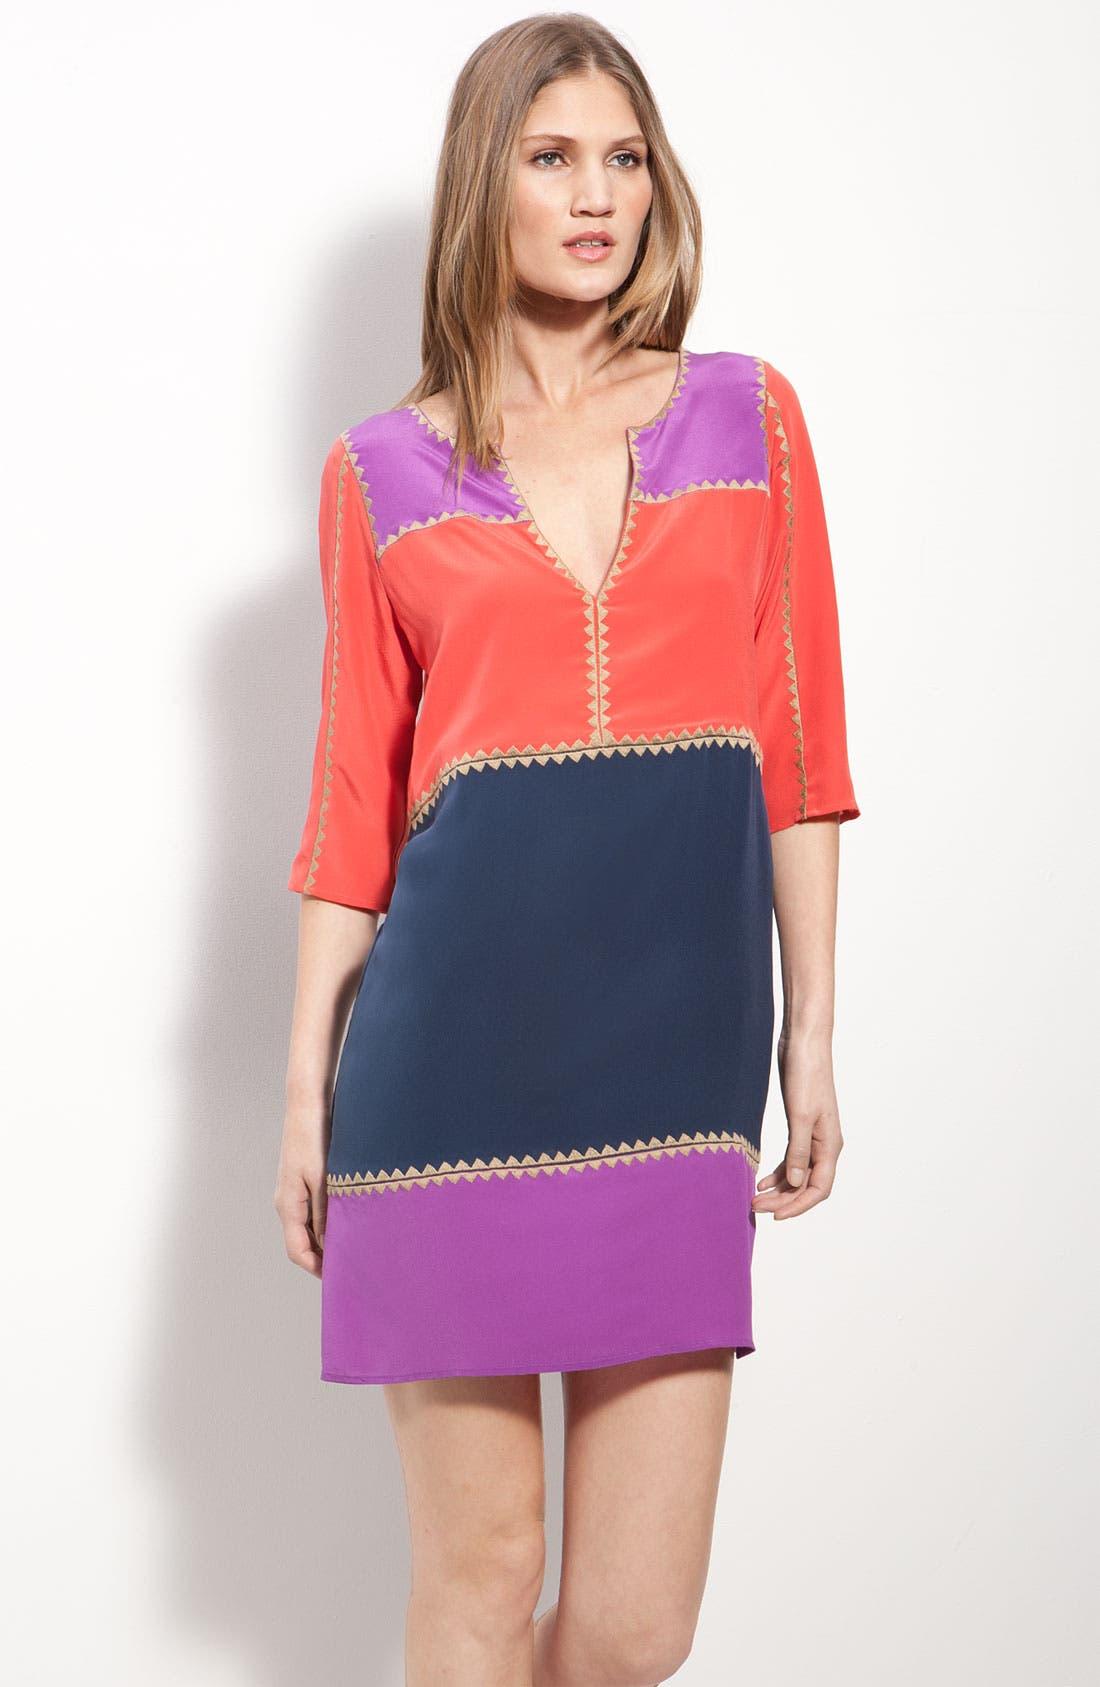 BCBGMAXAZRIA 'Aidas' Colorblock Minidress, Main, color, 695